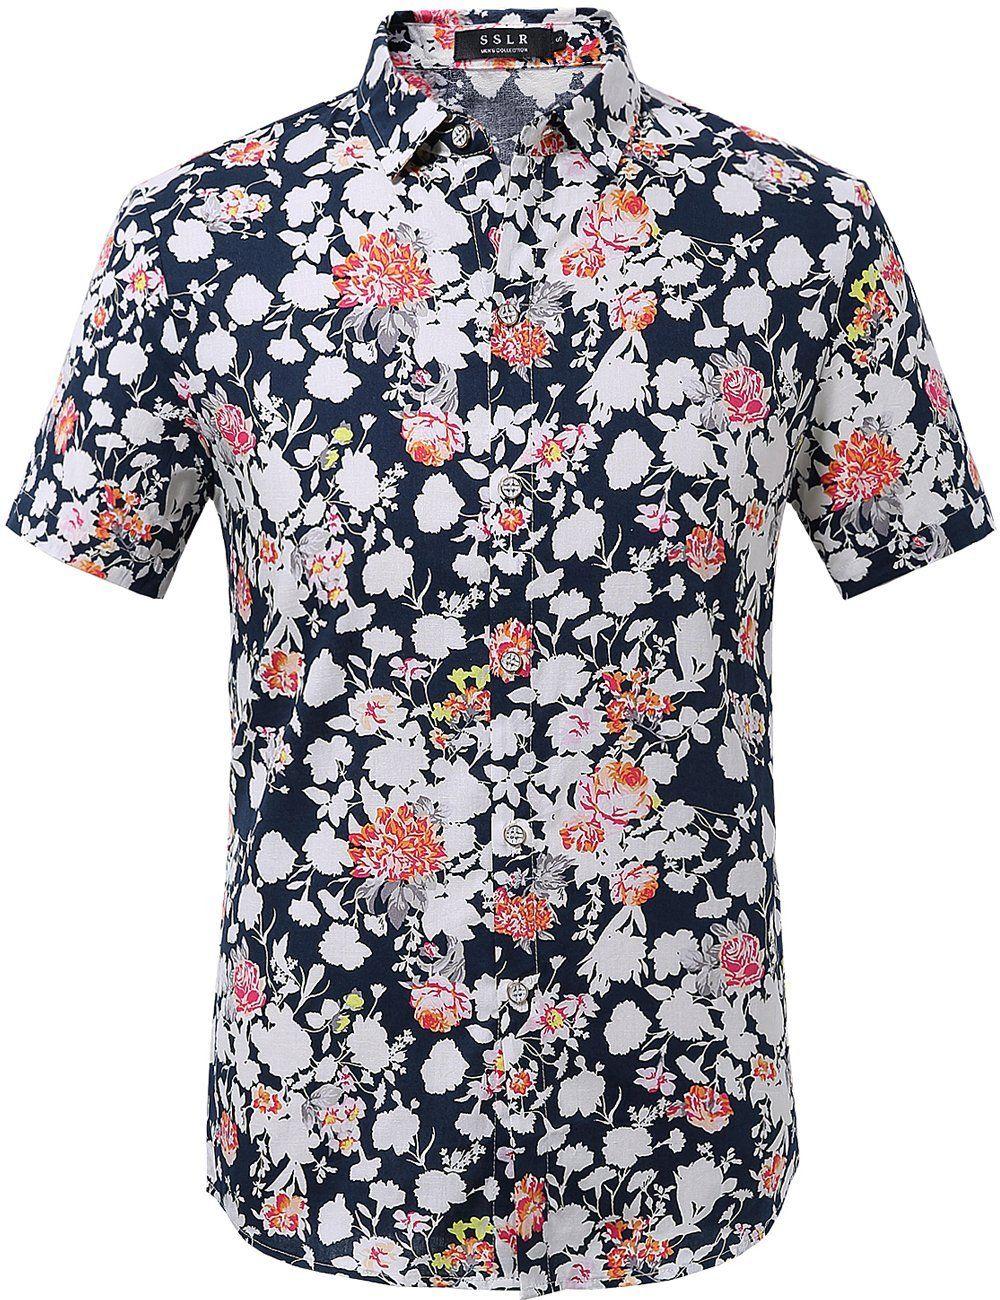 c10a839771502 SSLR Men s Summer Casual Floral Short Sleeve Shirt (Large